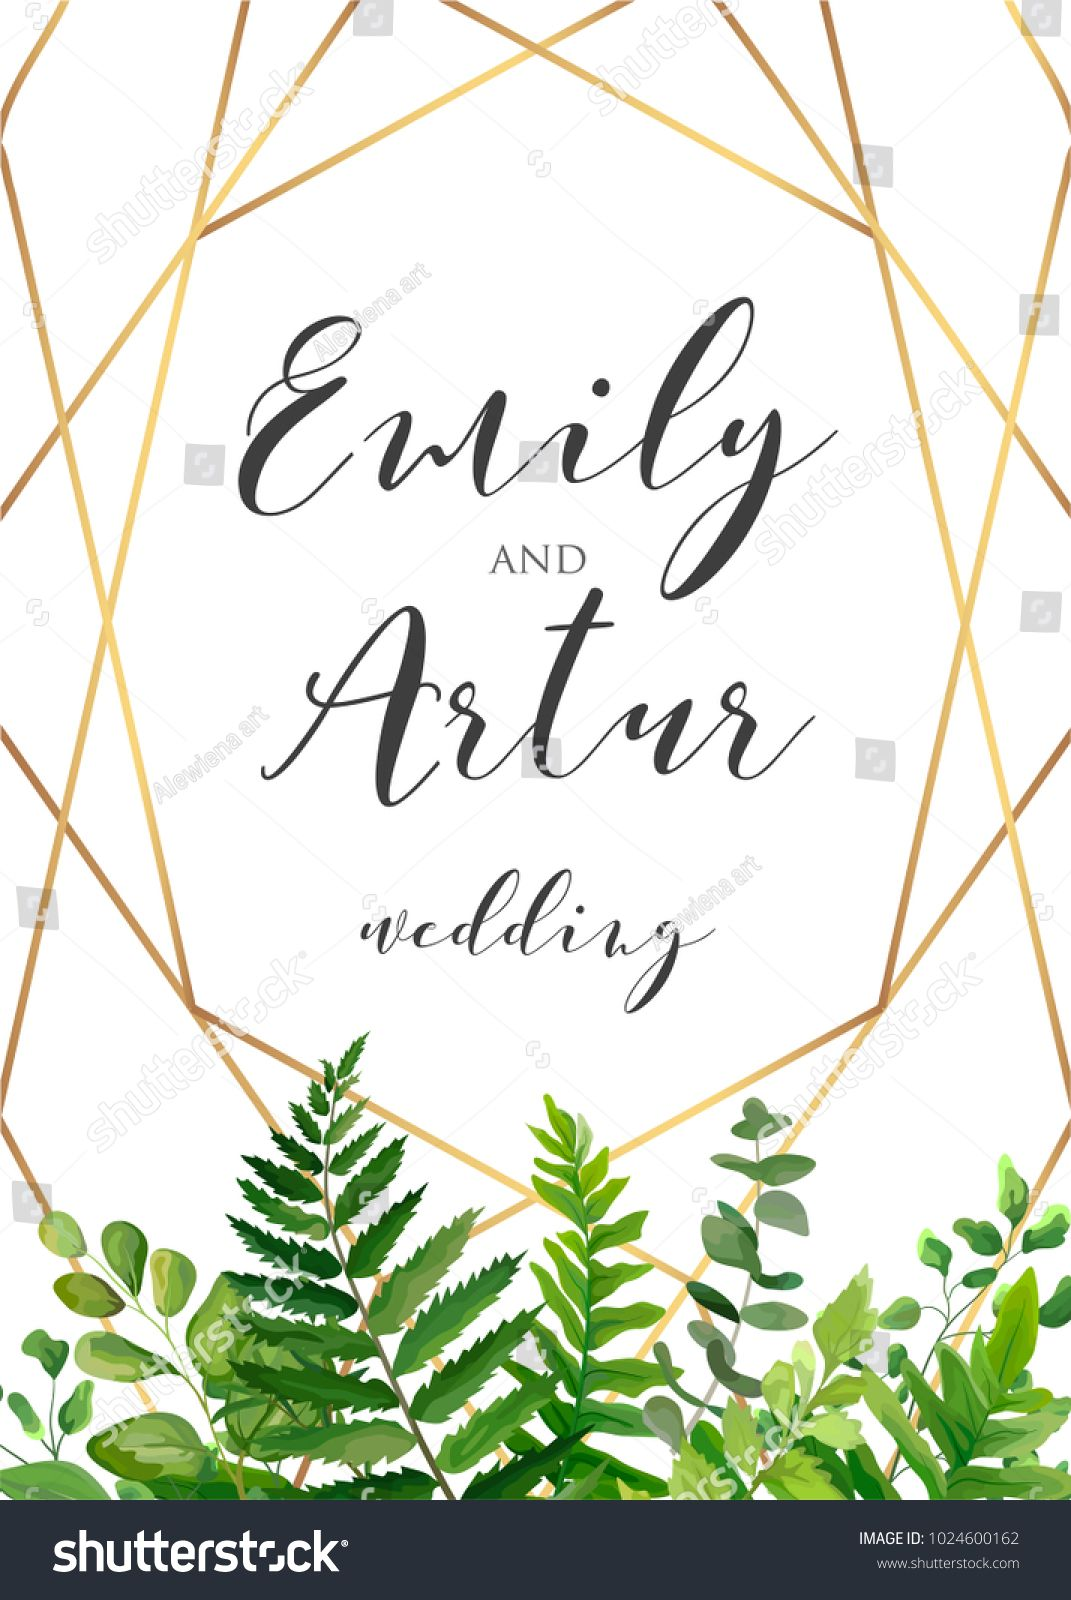 Vector botanical wedding floral invitation invite save the date vector botanical wedding floral invitation invite save the date card elegant modern design stopboris Images